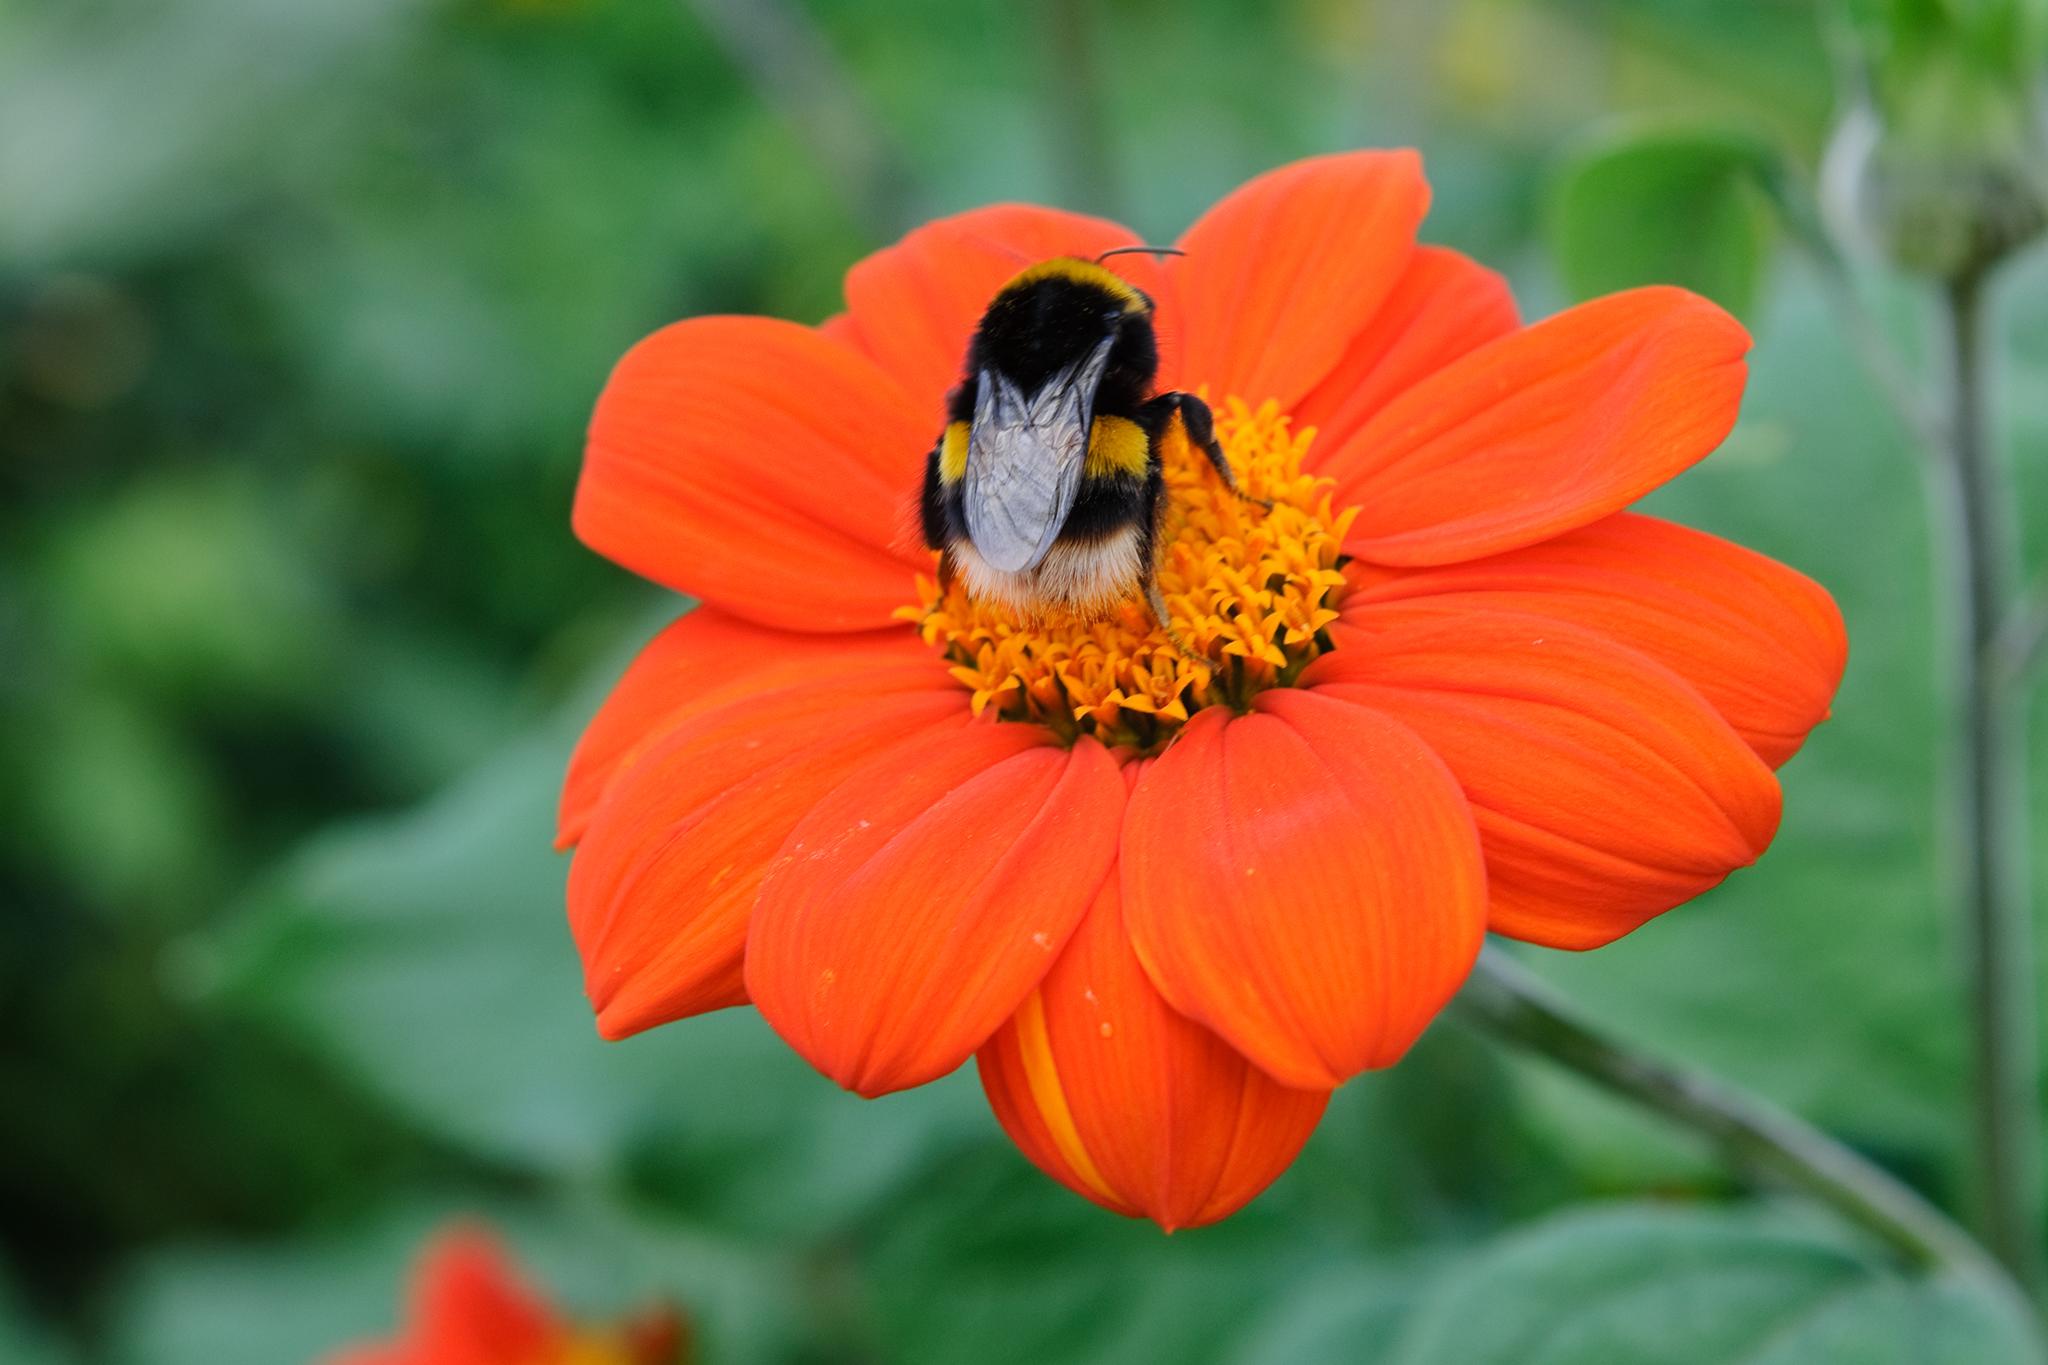 How To Make a Bee-Friendly Garden - gardenersworld.com